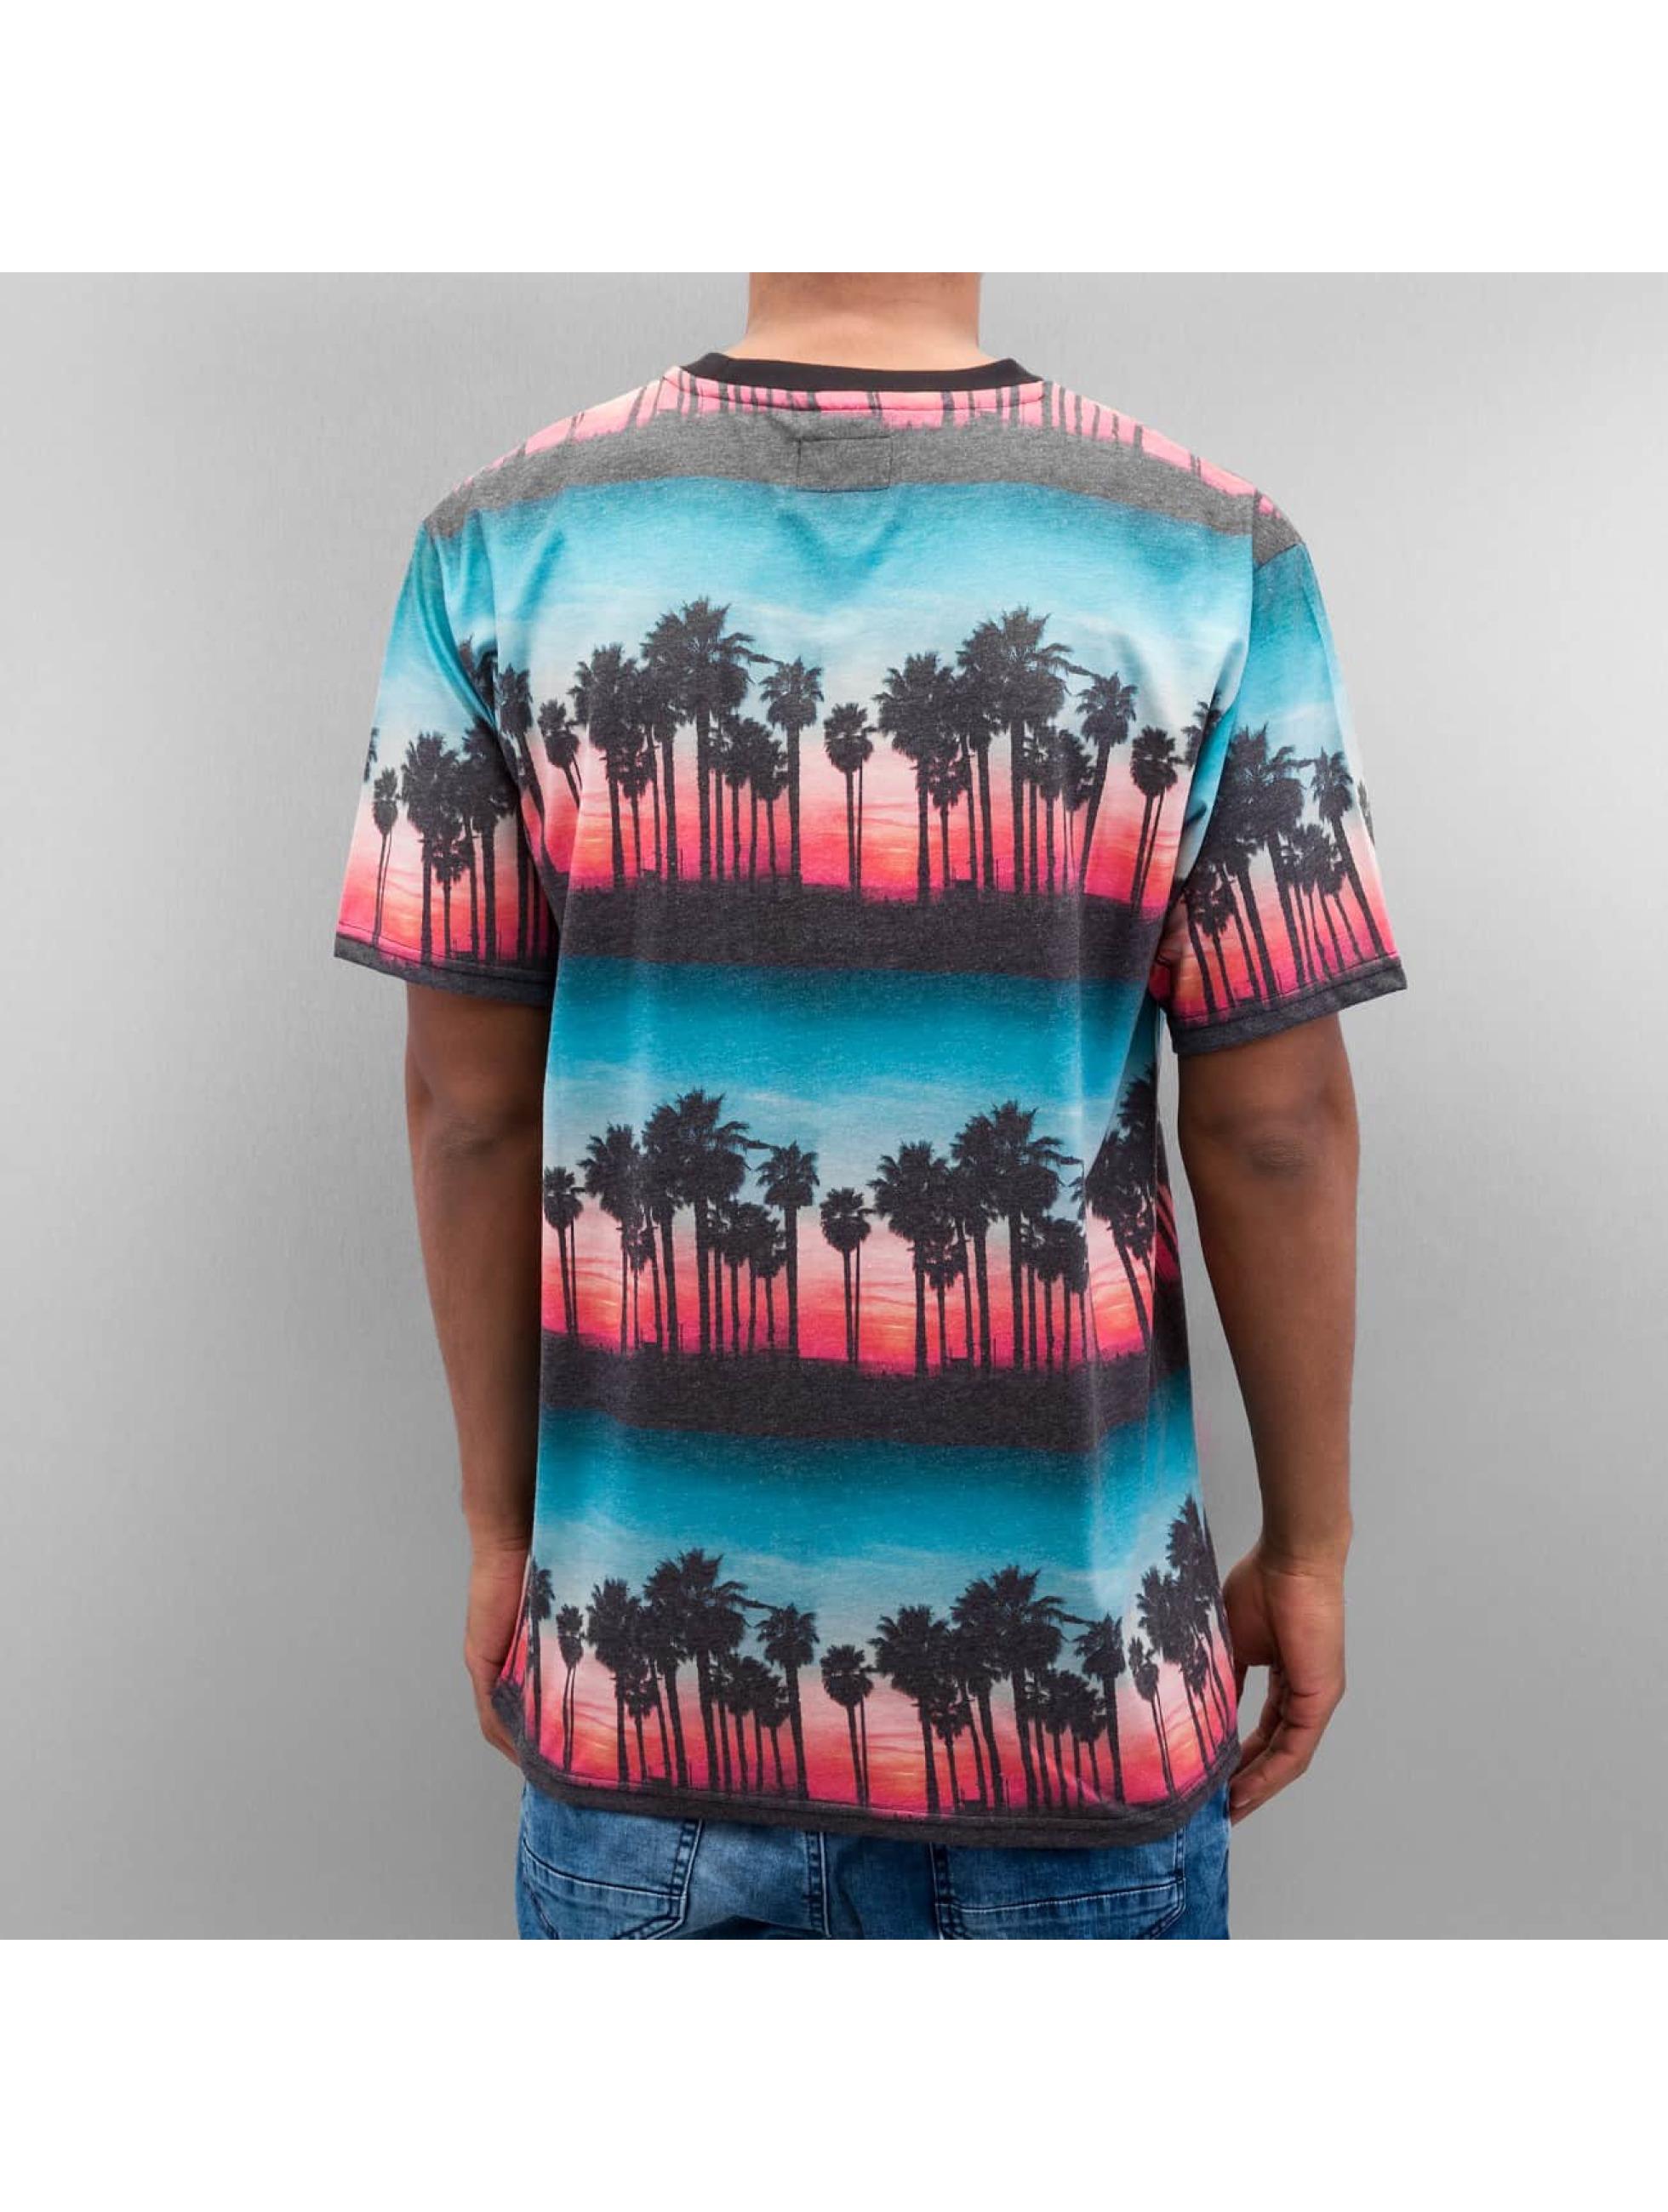 NEFF T-shirt Sunset Dreams färgad